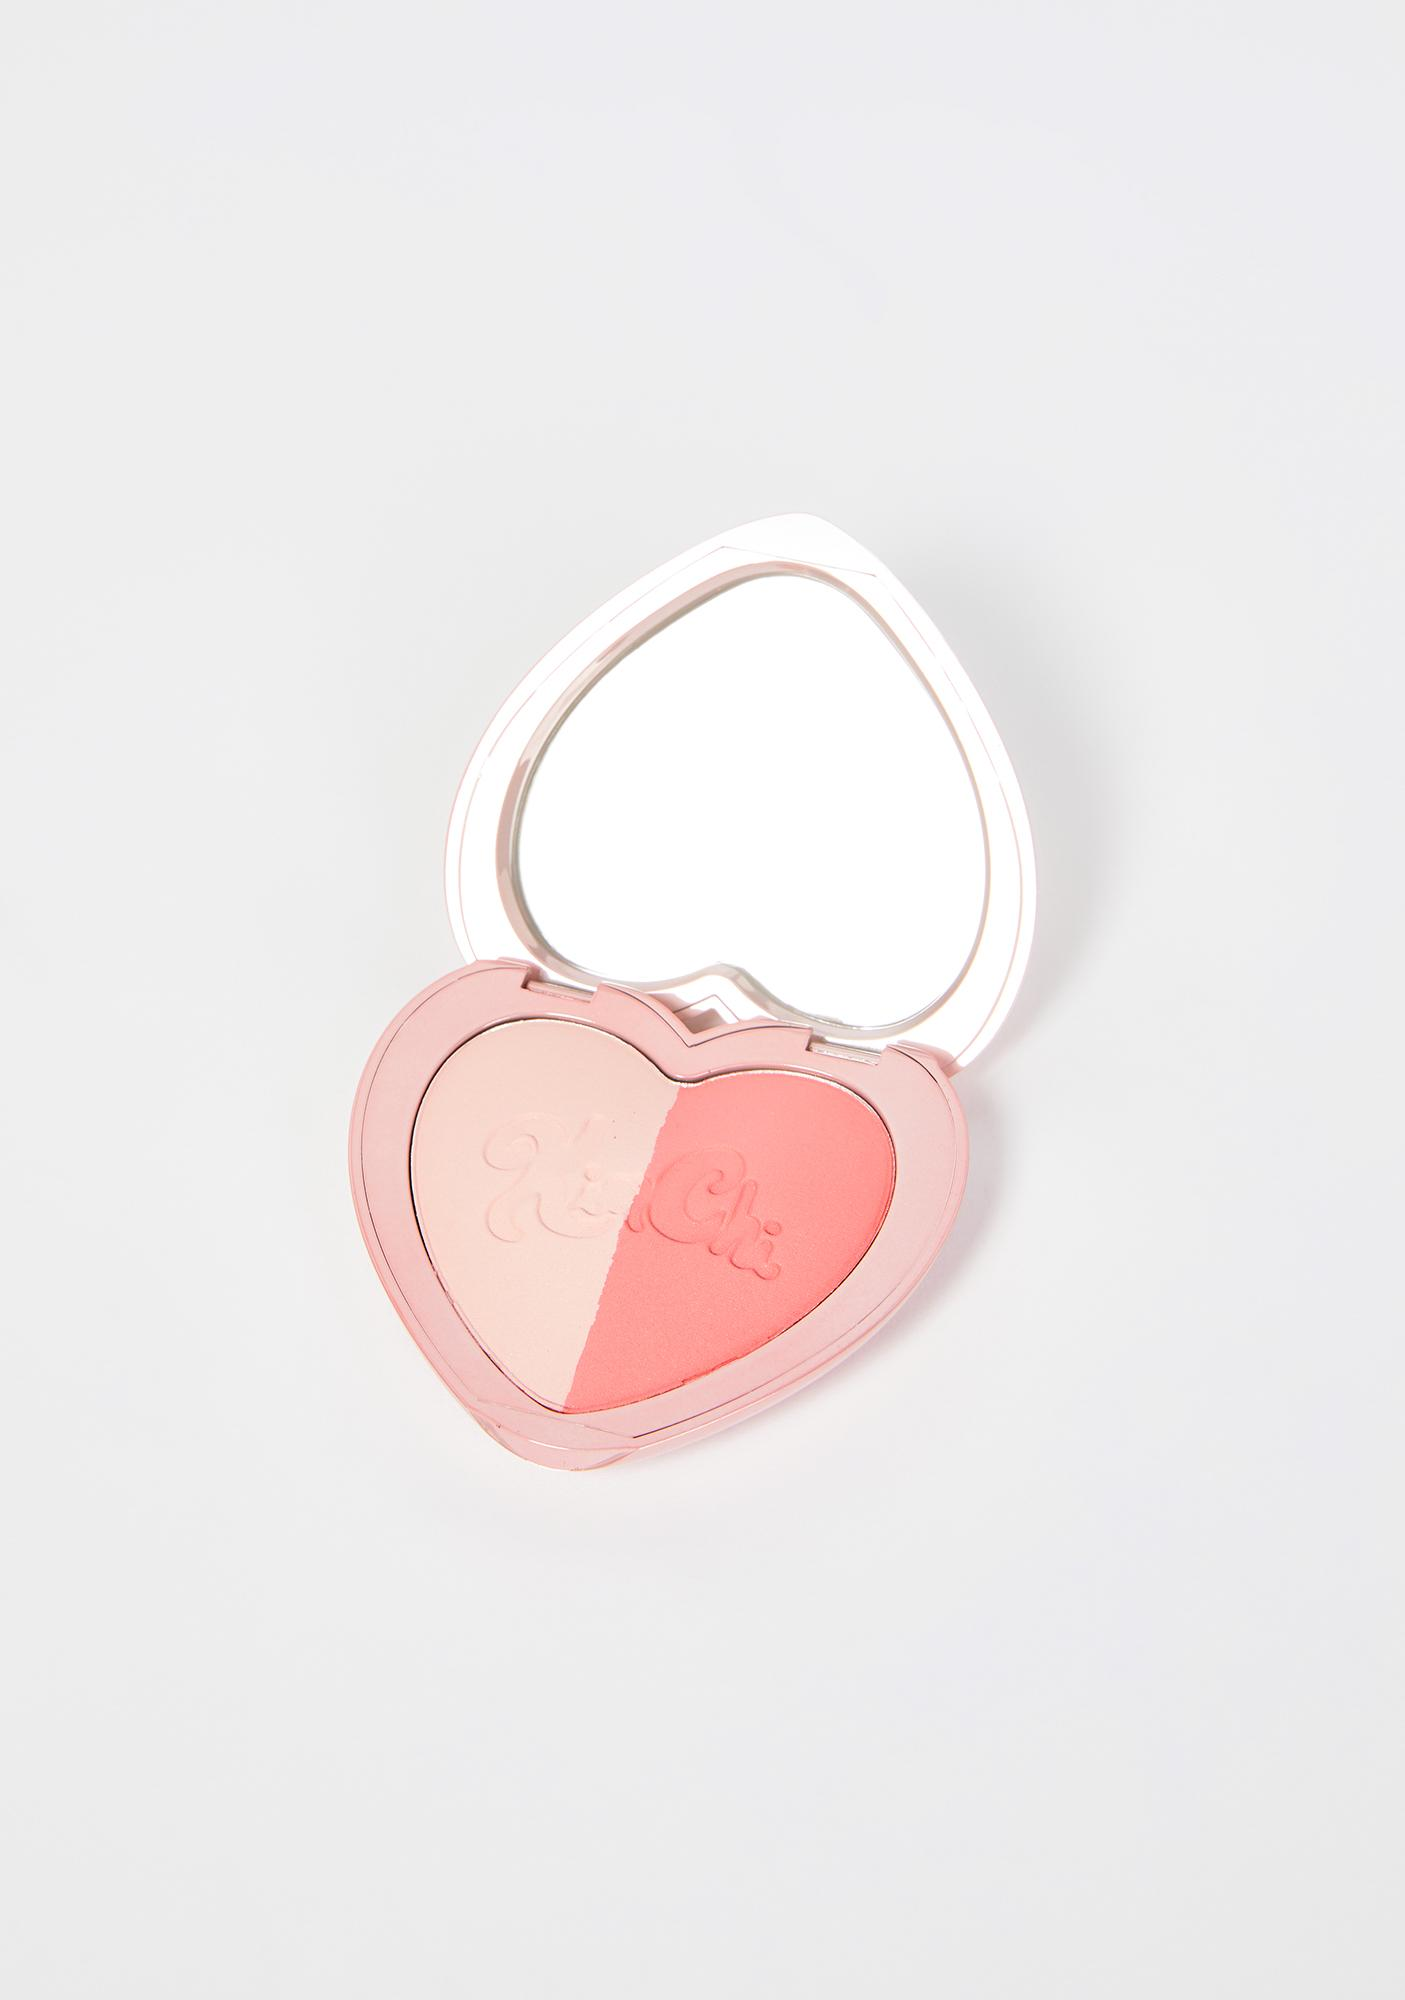 KimChi Chic Beauty Peachy Thailor Blush